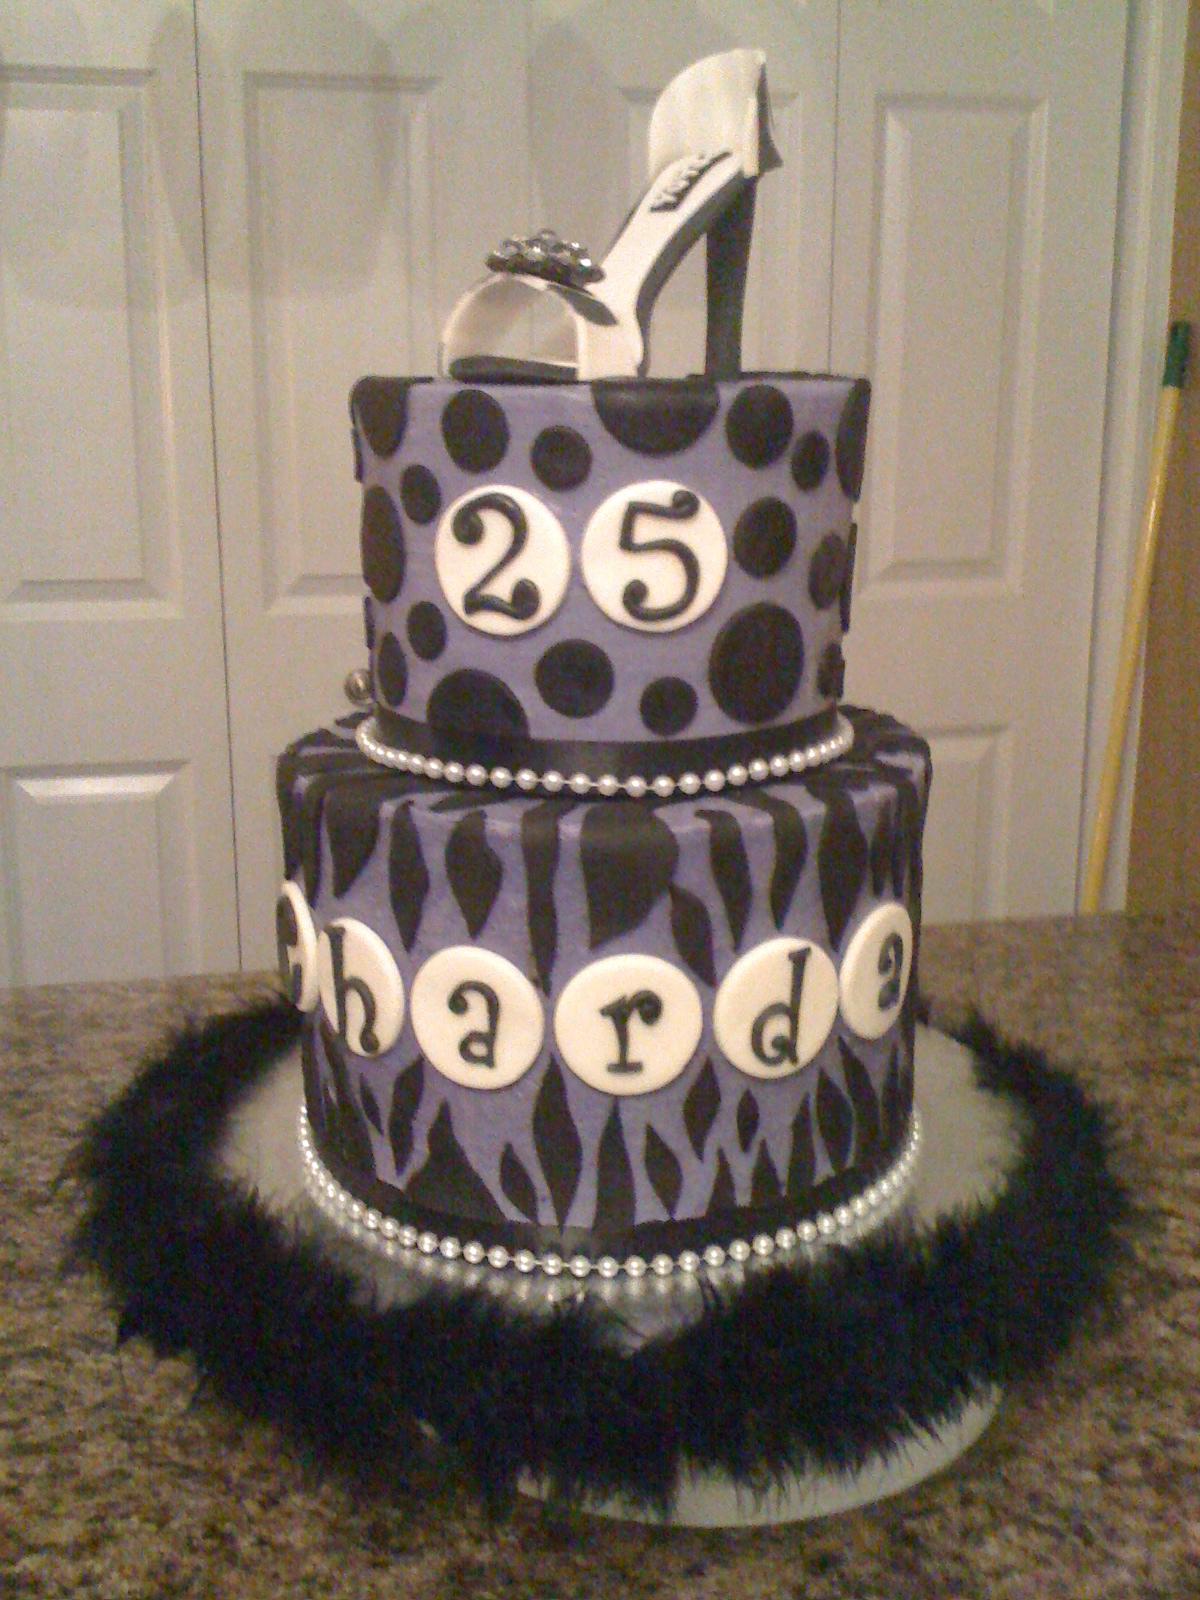 Diddy Bop Bakery February 2012